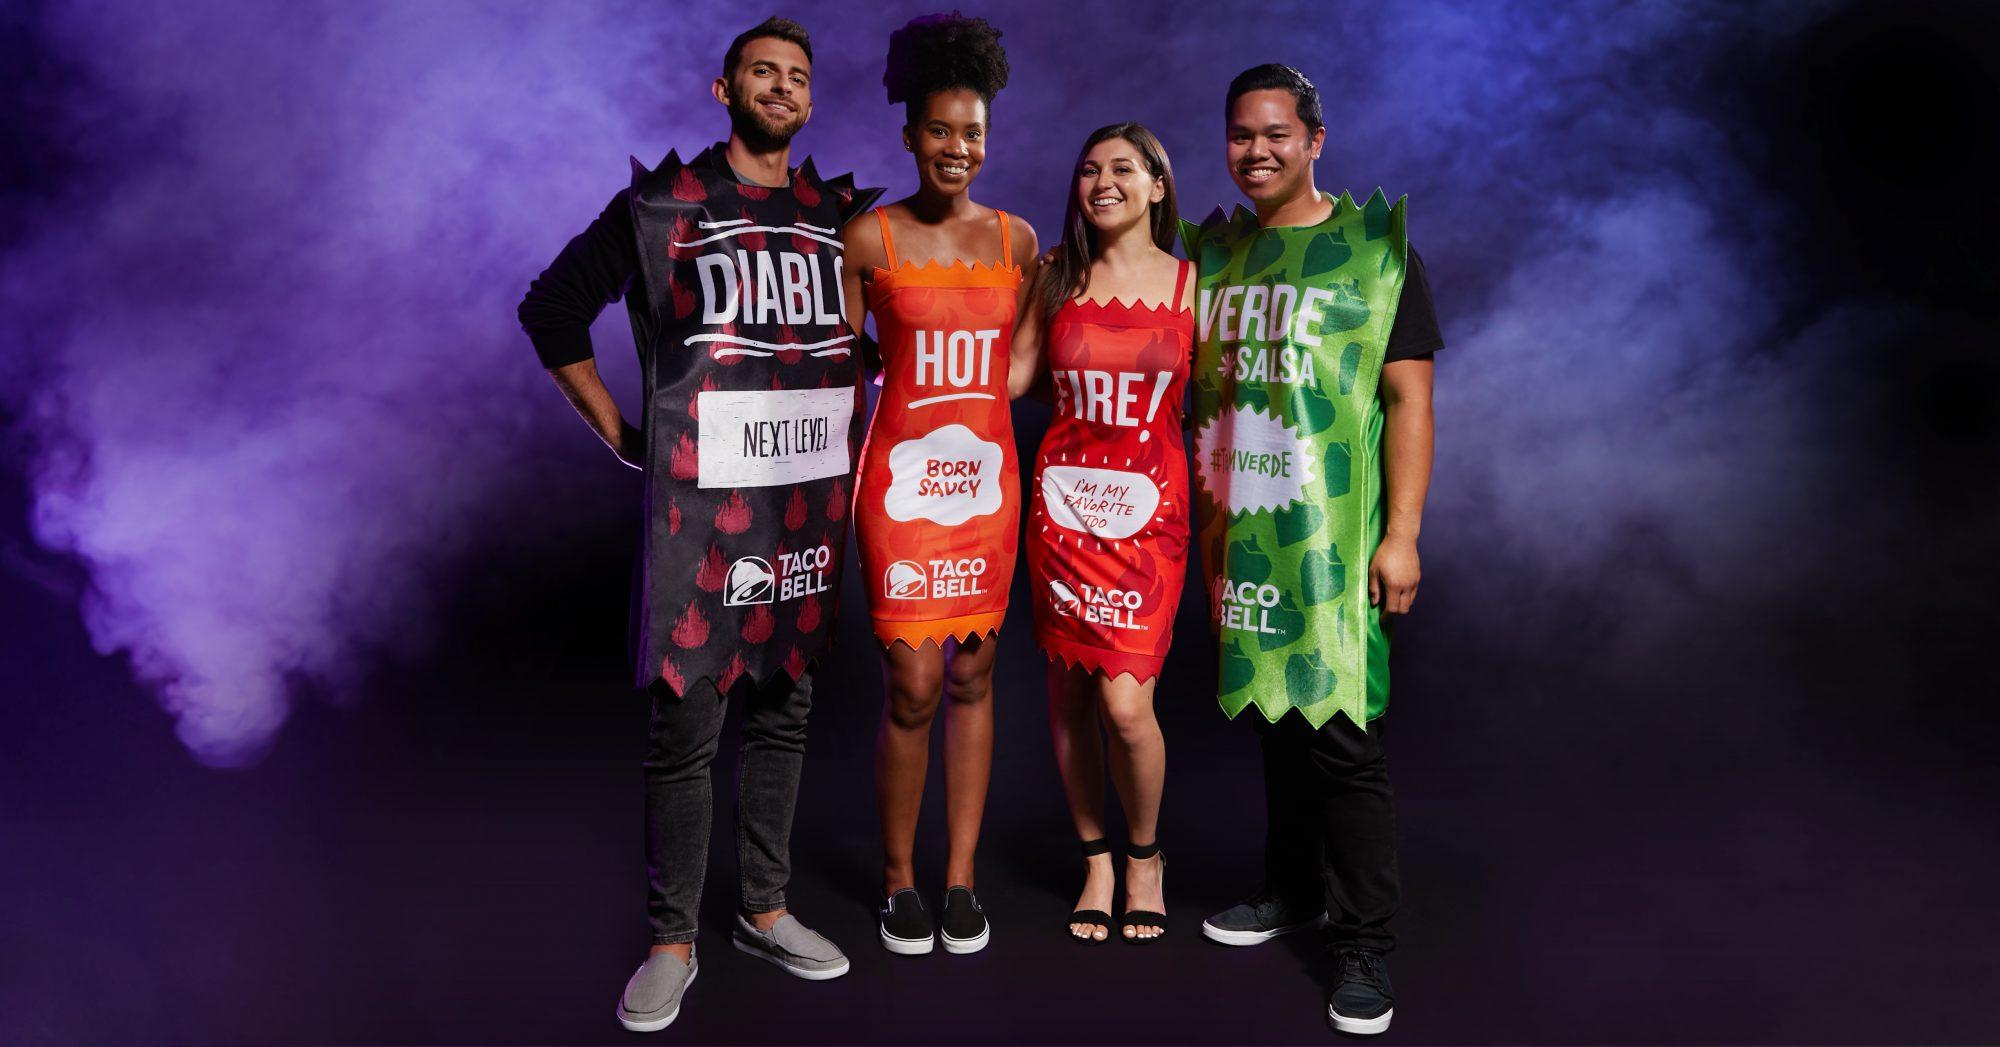 Diable Sauce Tunic, Hot Sauce Dress, Fire Sauce Dress, Verde Sauce Tunic